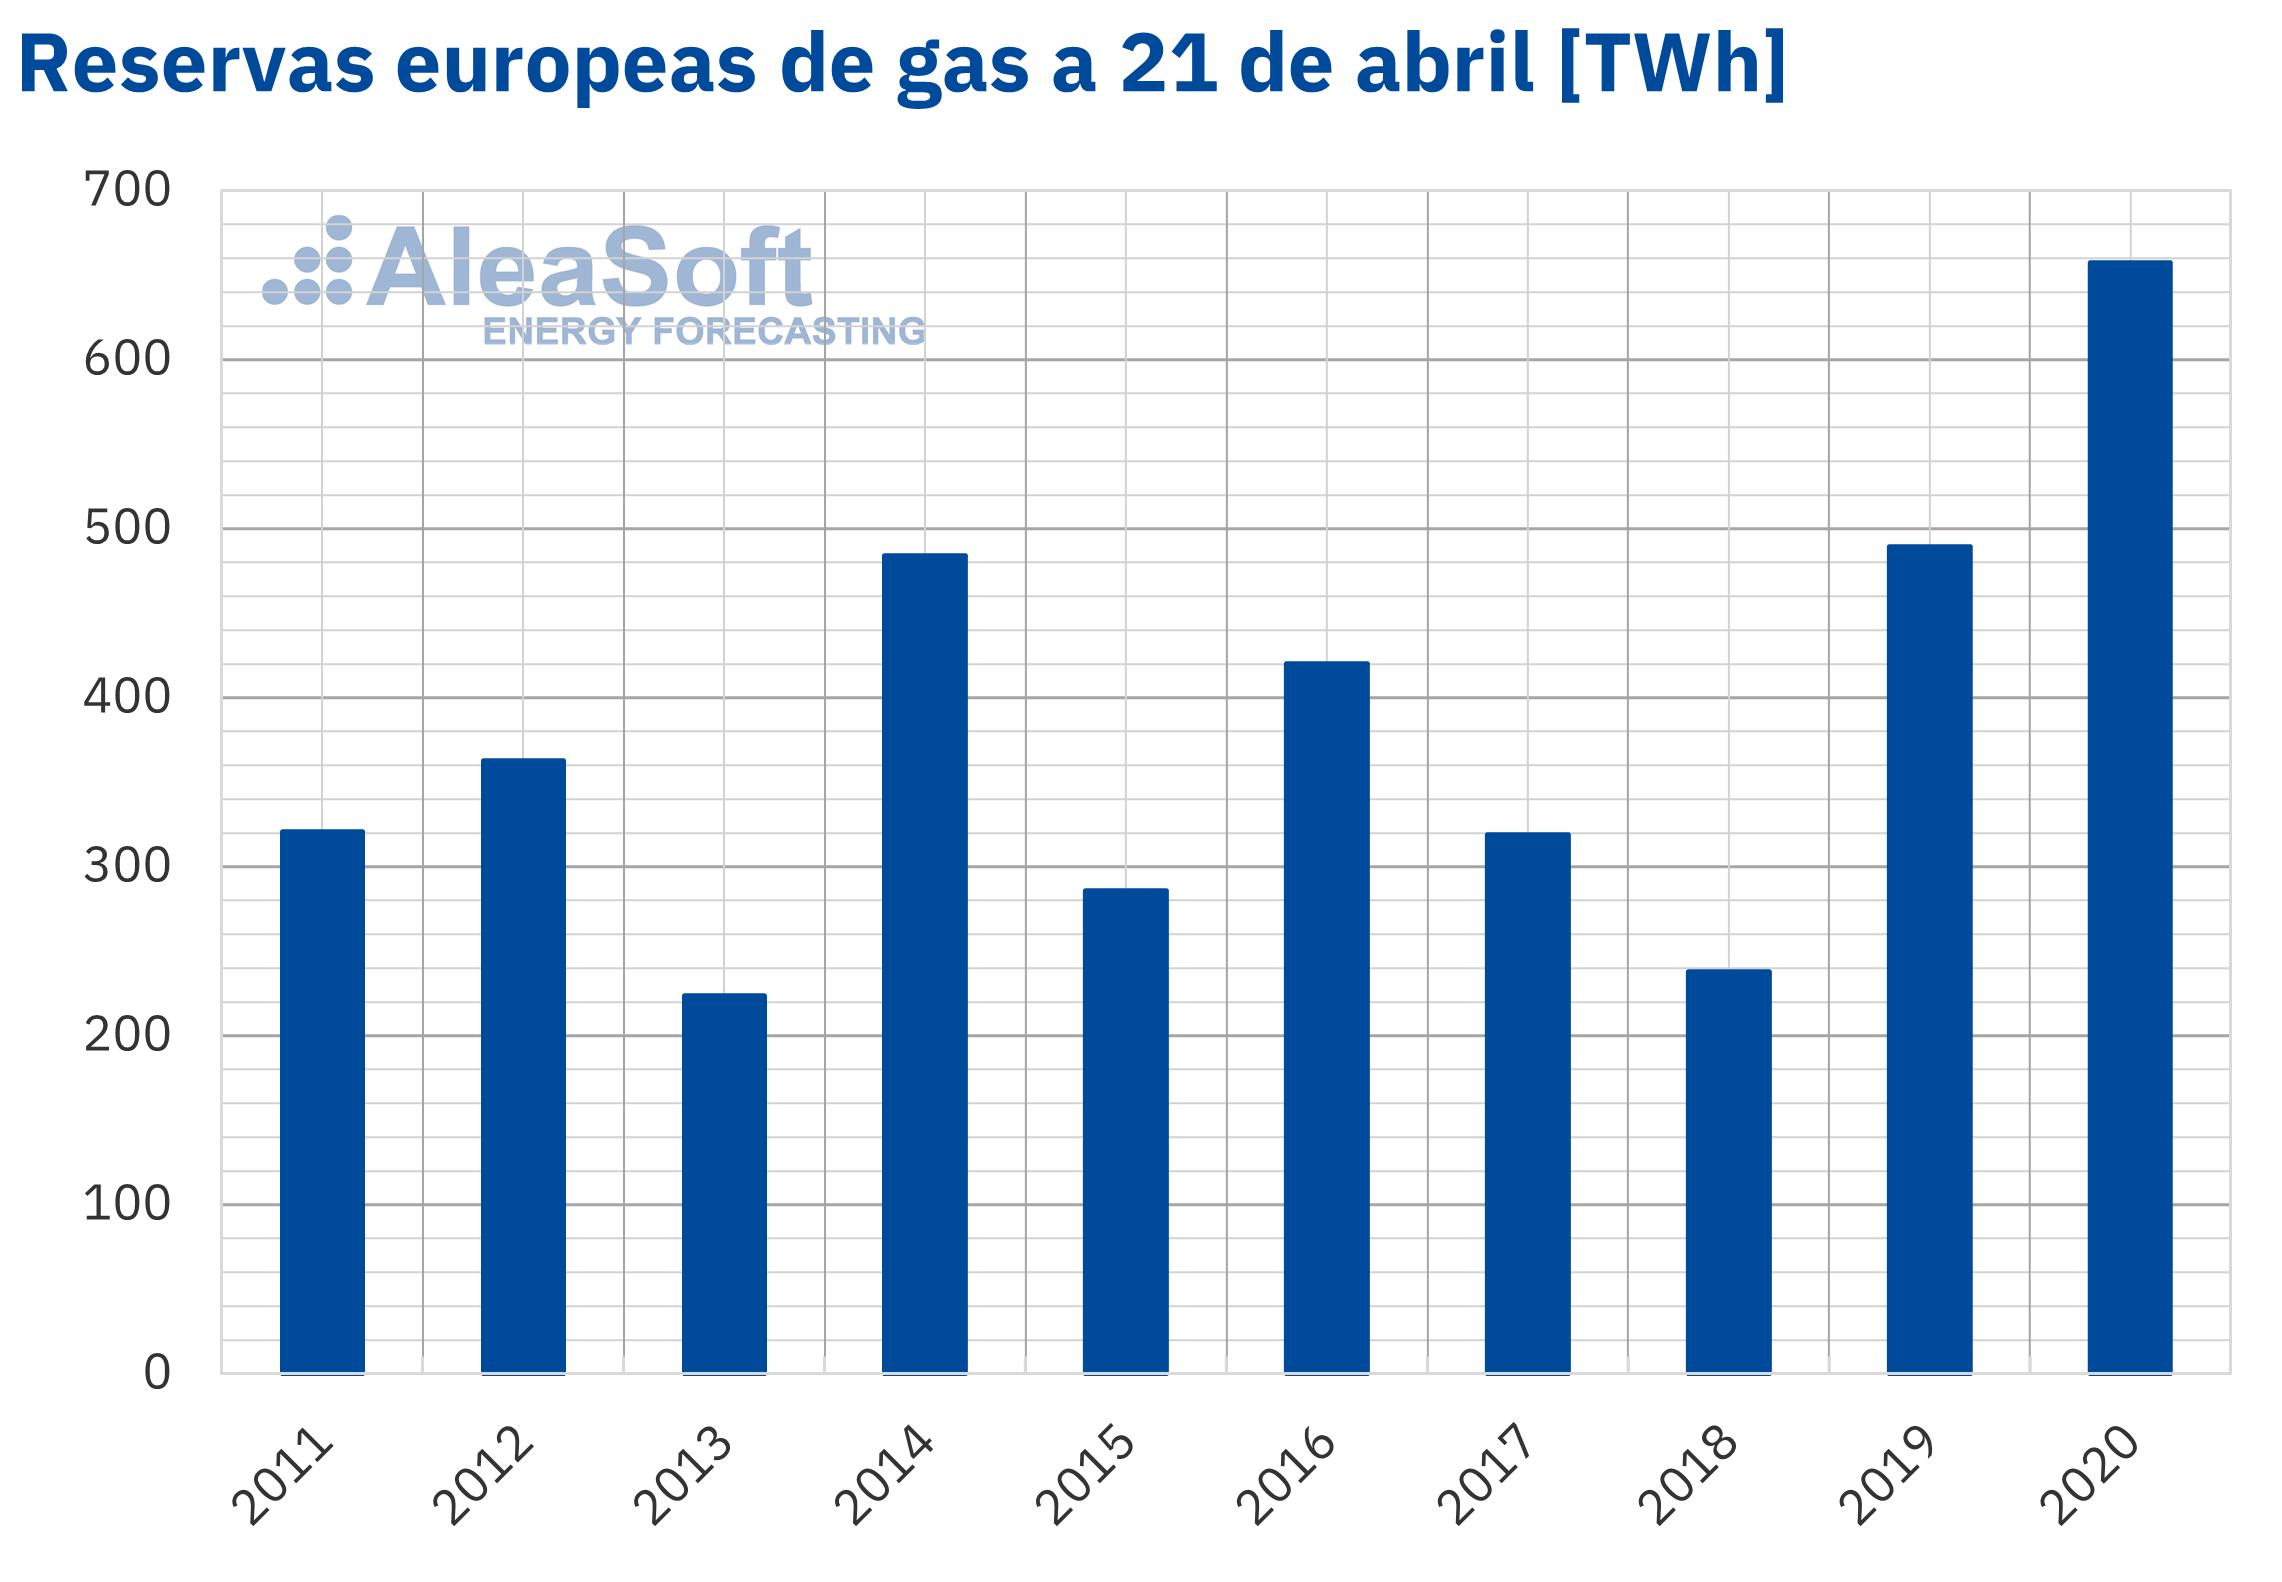 AleaSoft - Gas reservas Europa 21 abril